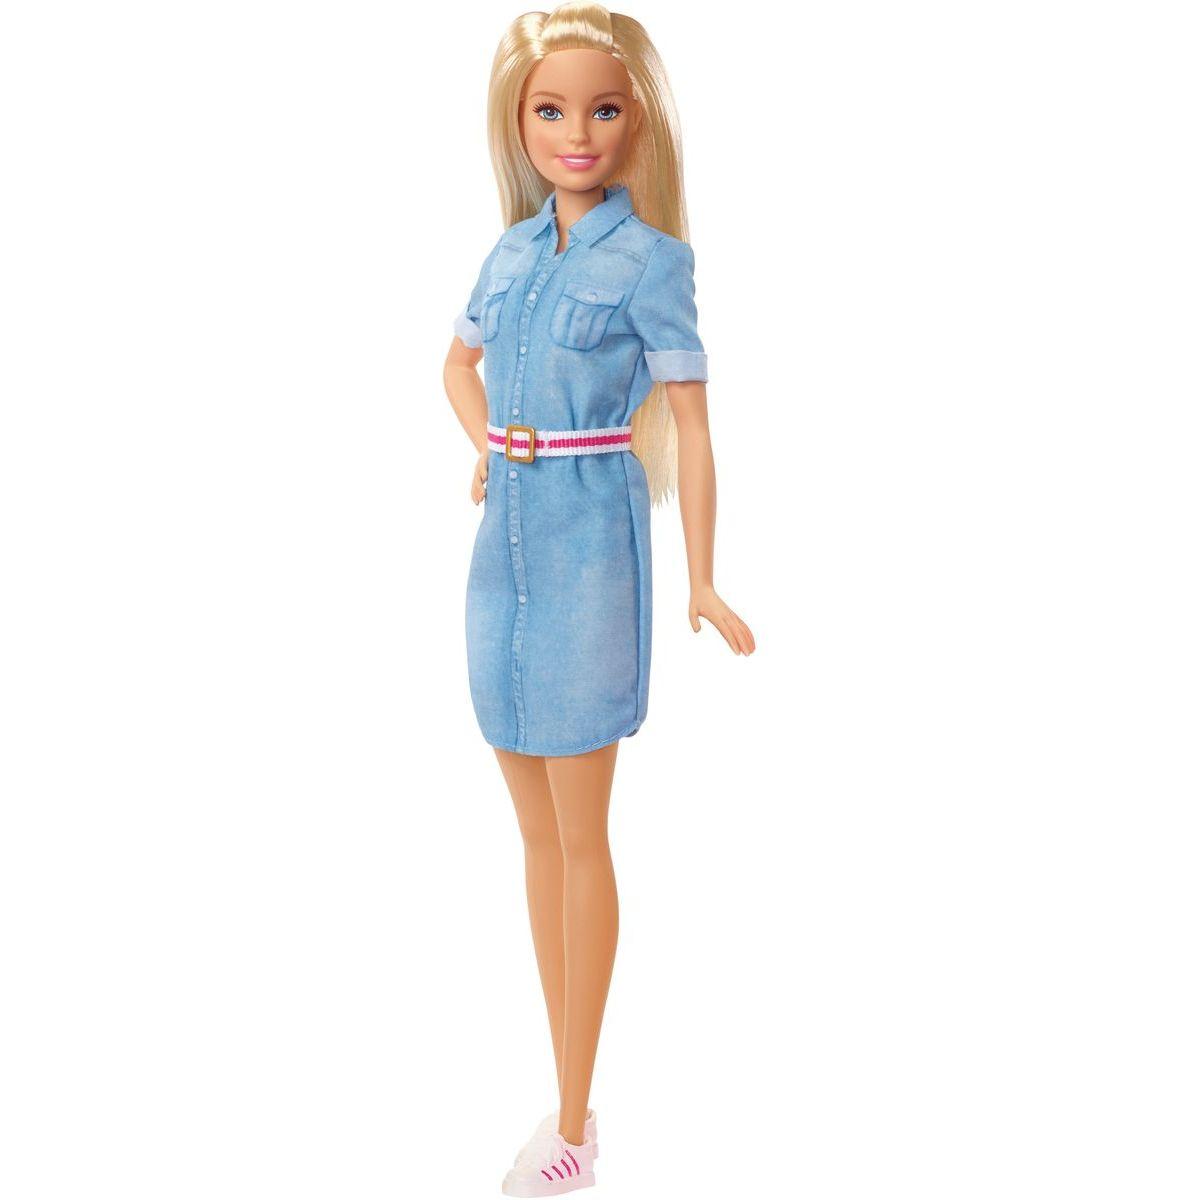 Mattel Barbie bábika Dreamhouse Adventures